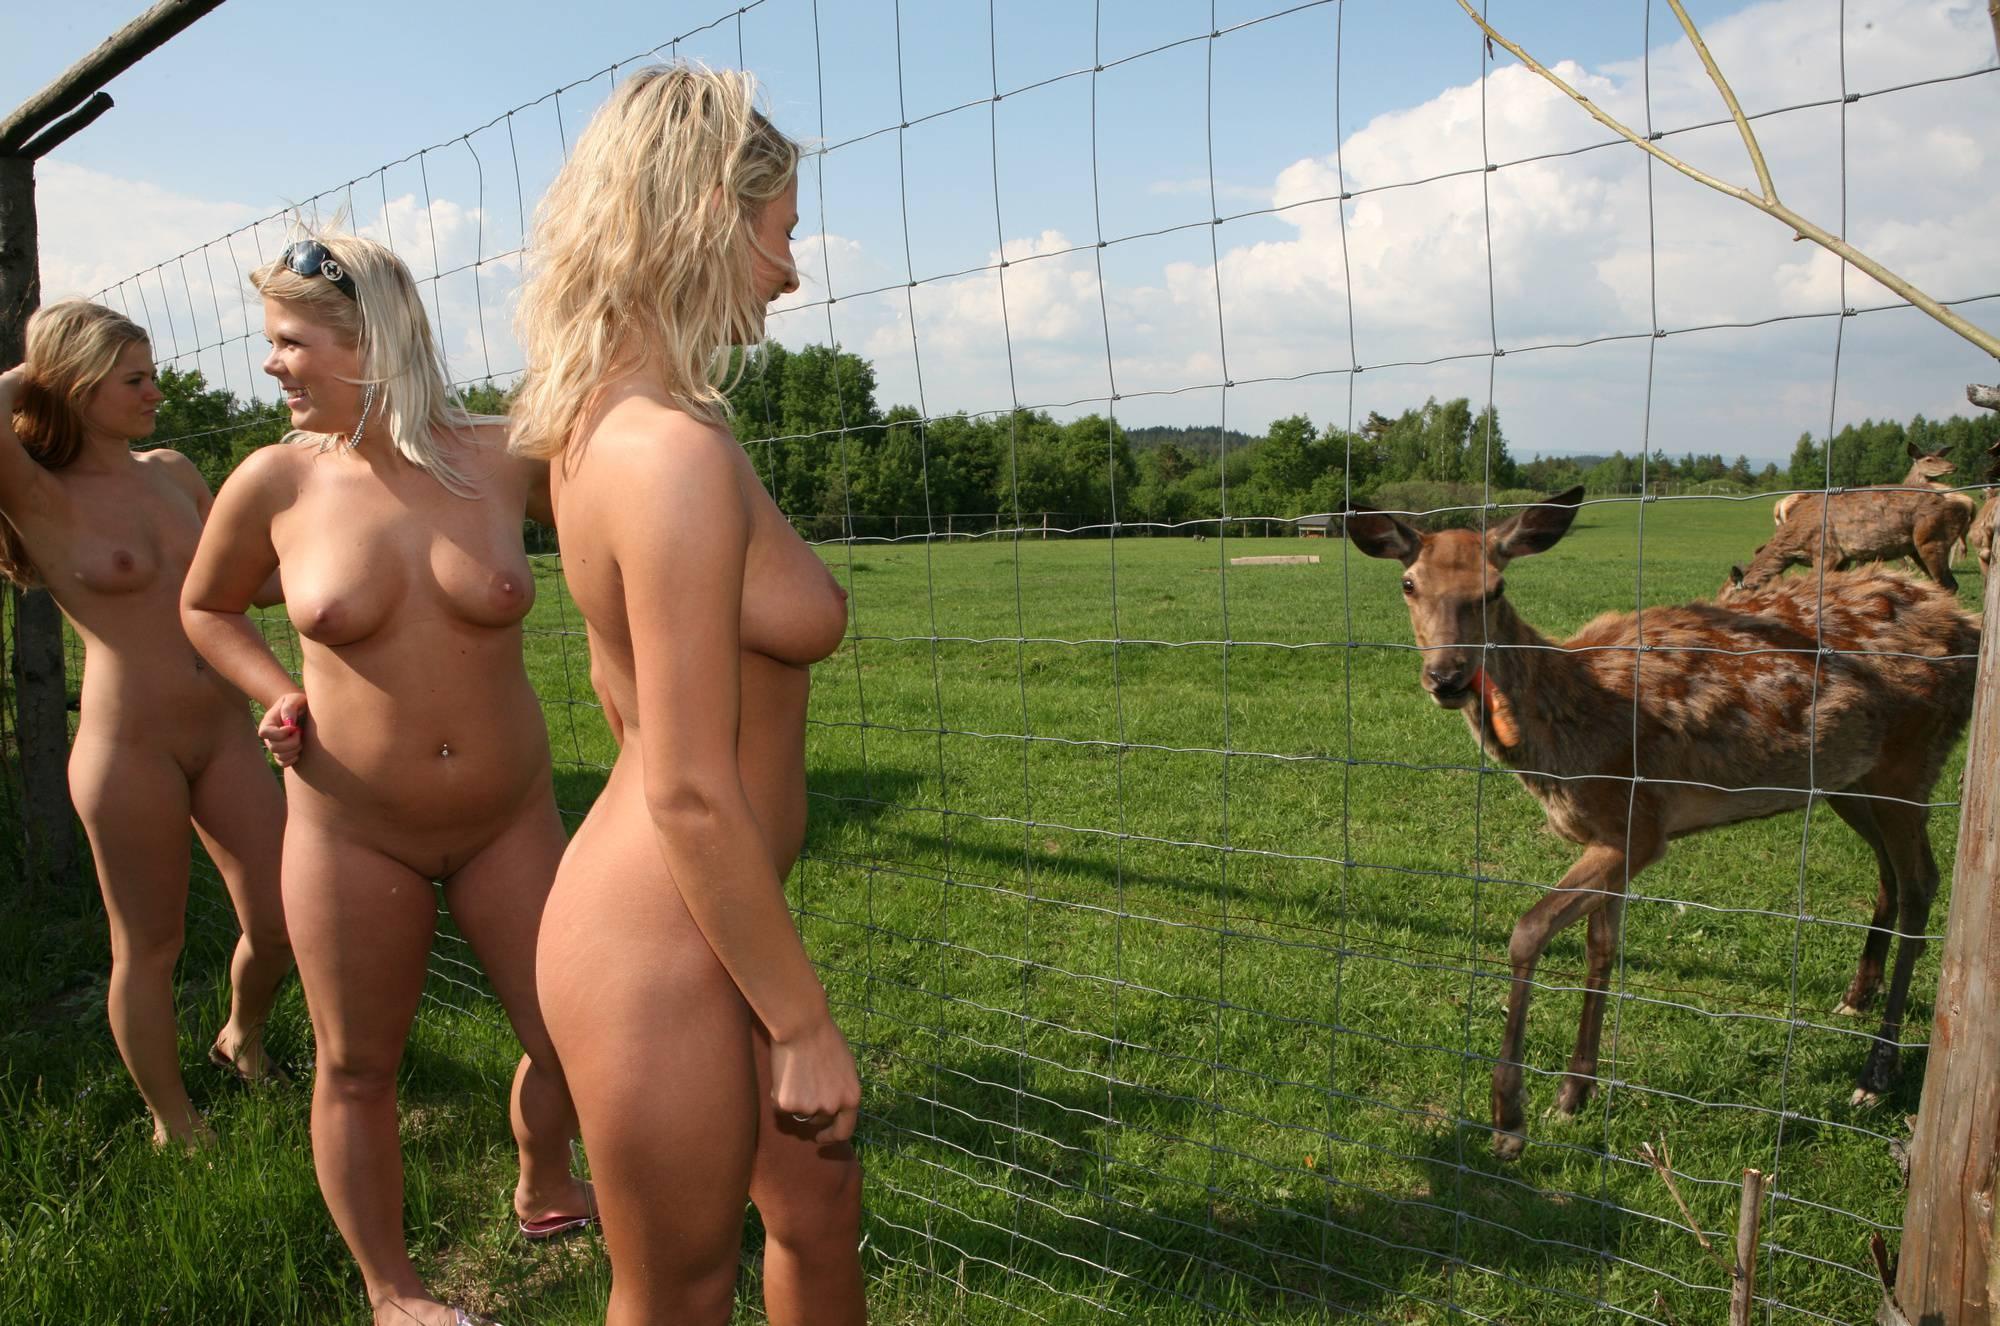 Woody Deer And Dog Field - 2